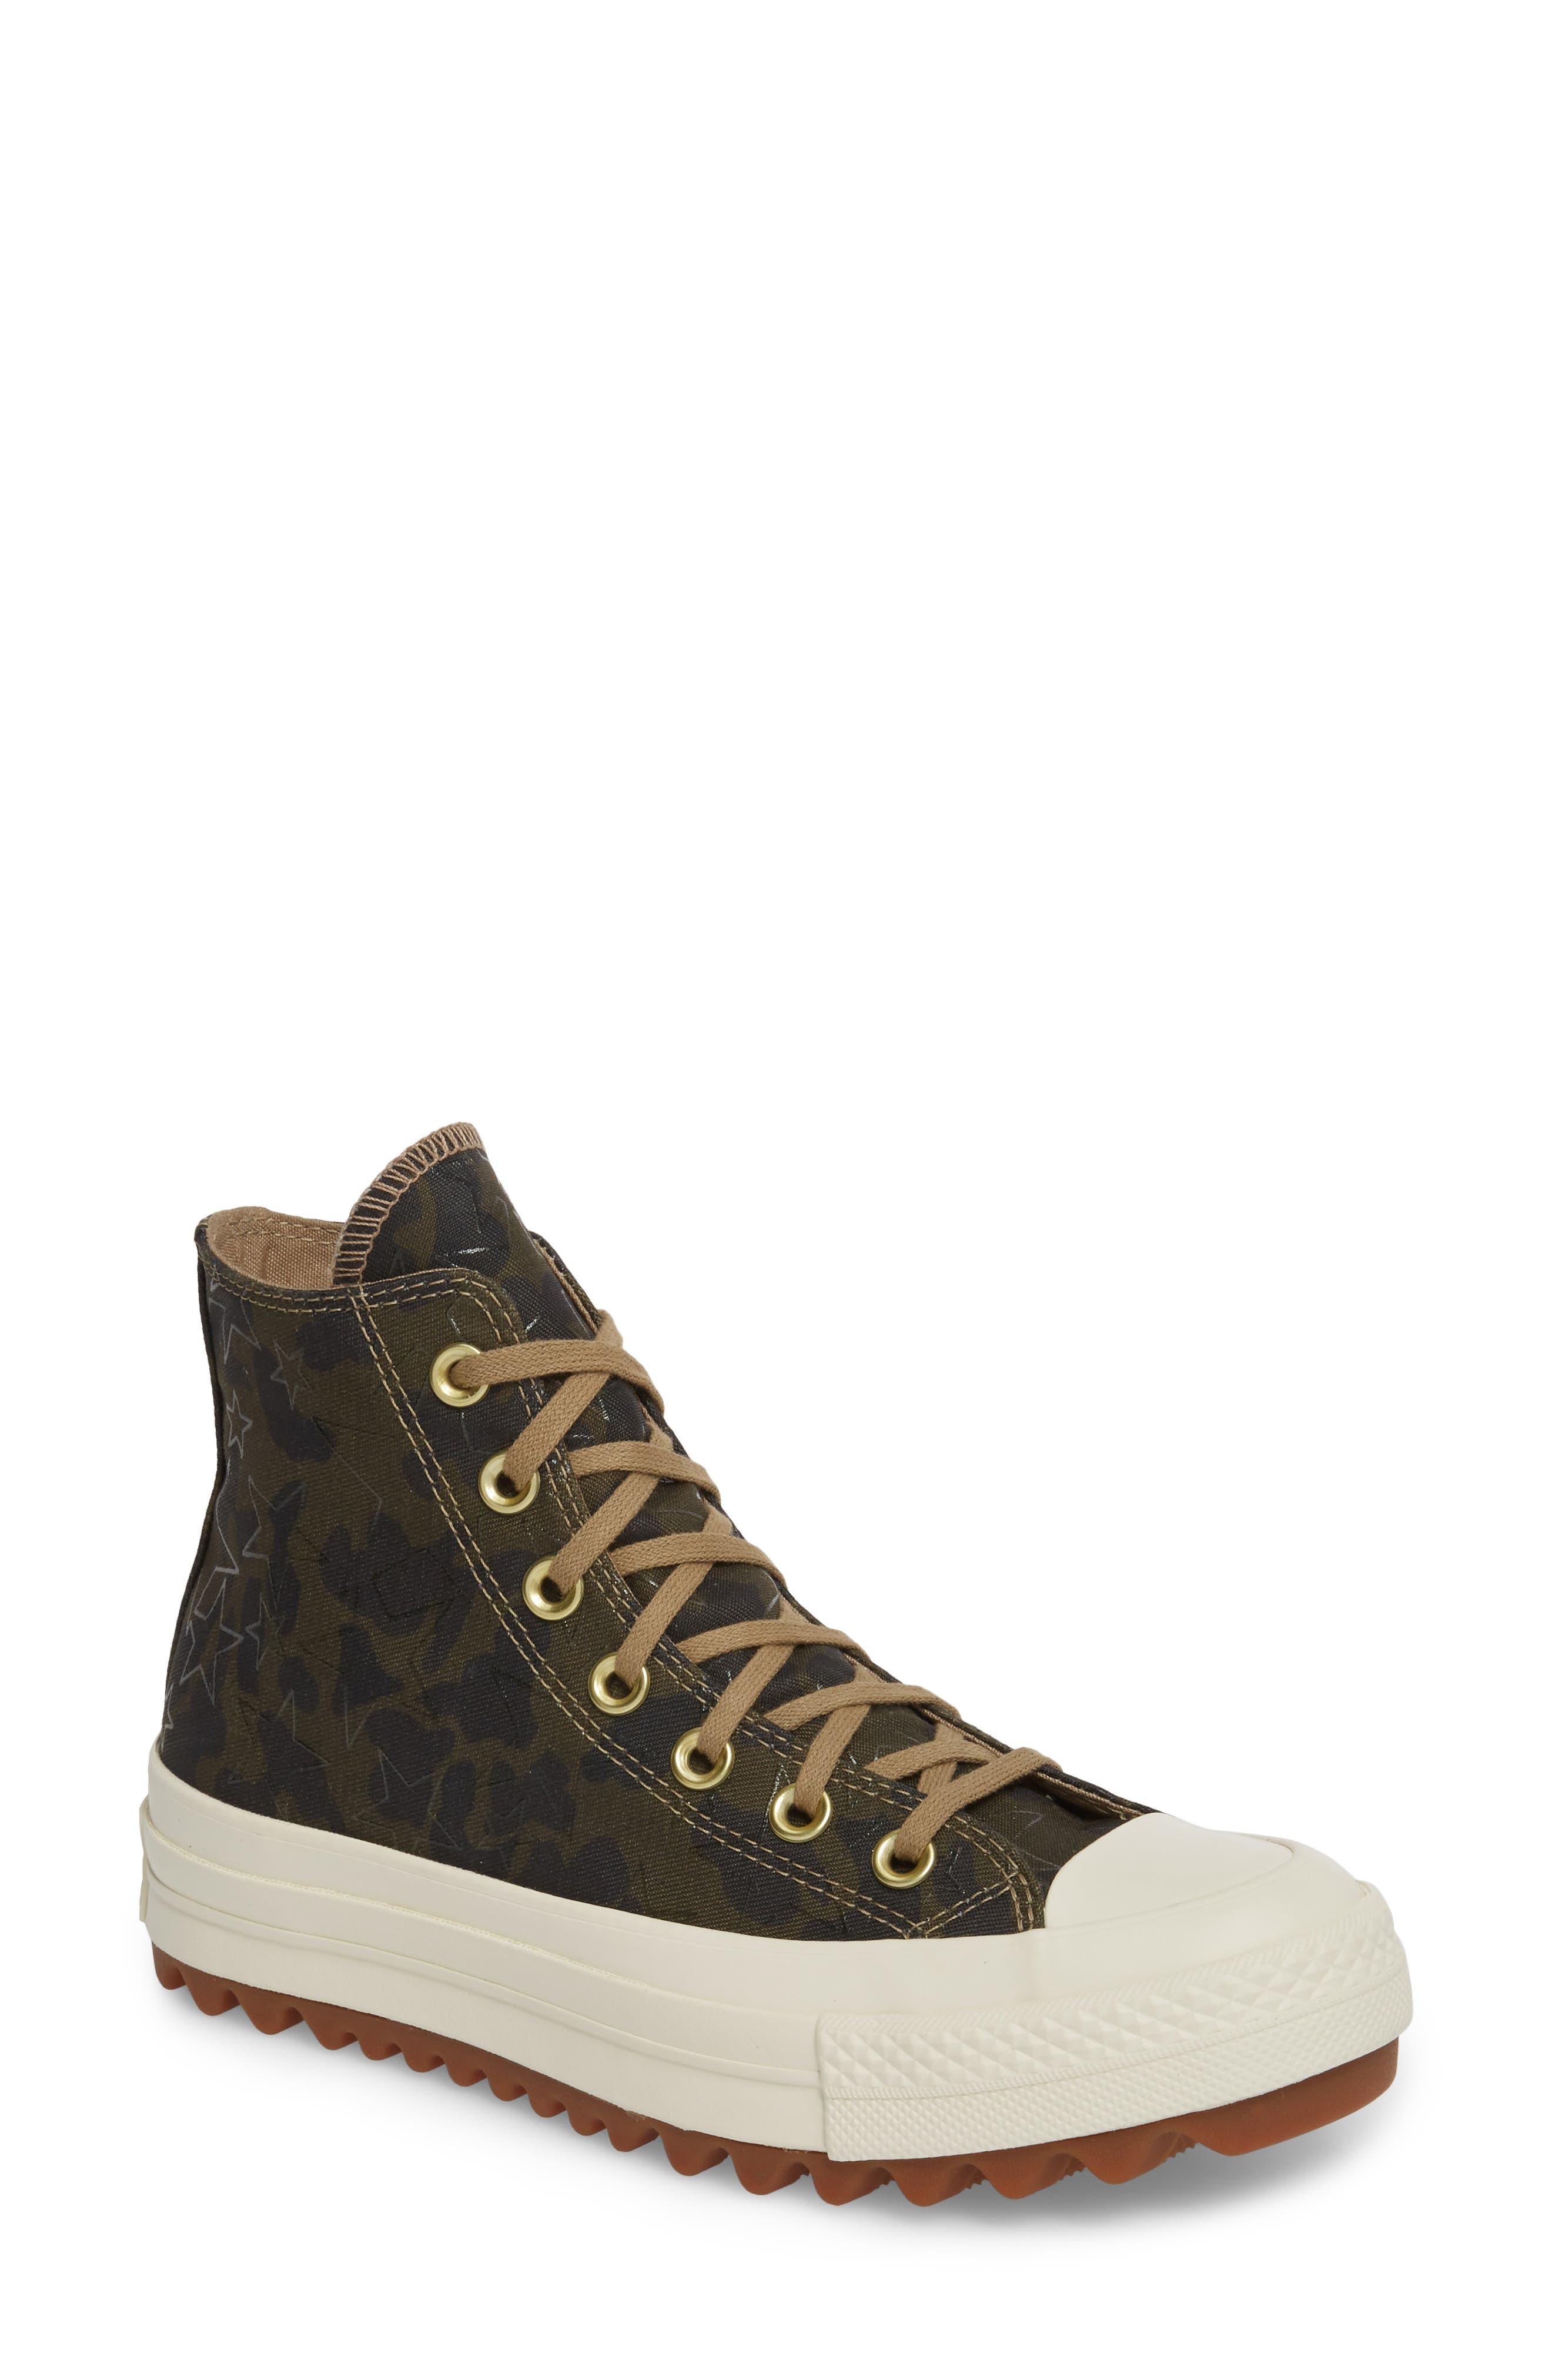 Alternate Image 1 Selected - Converse Chuck Taylor® All Star® Lift Ripple High Top Sneaker (Women)